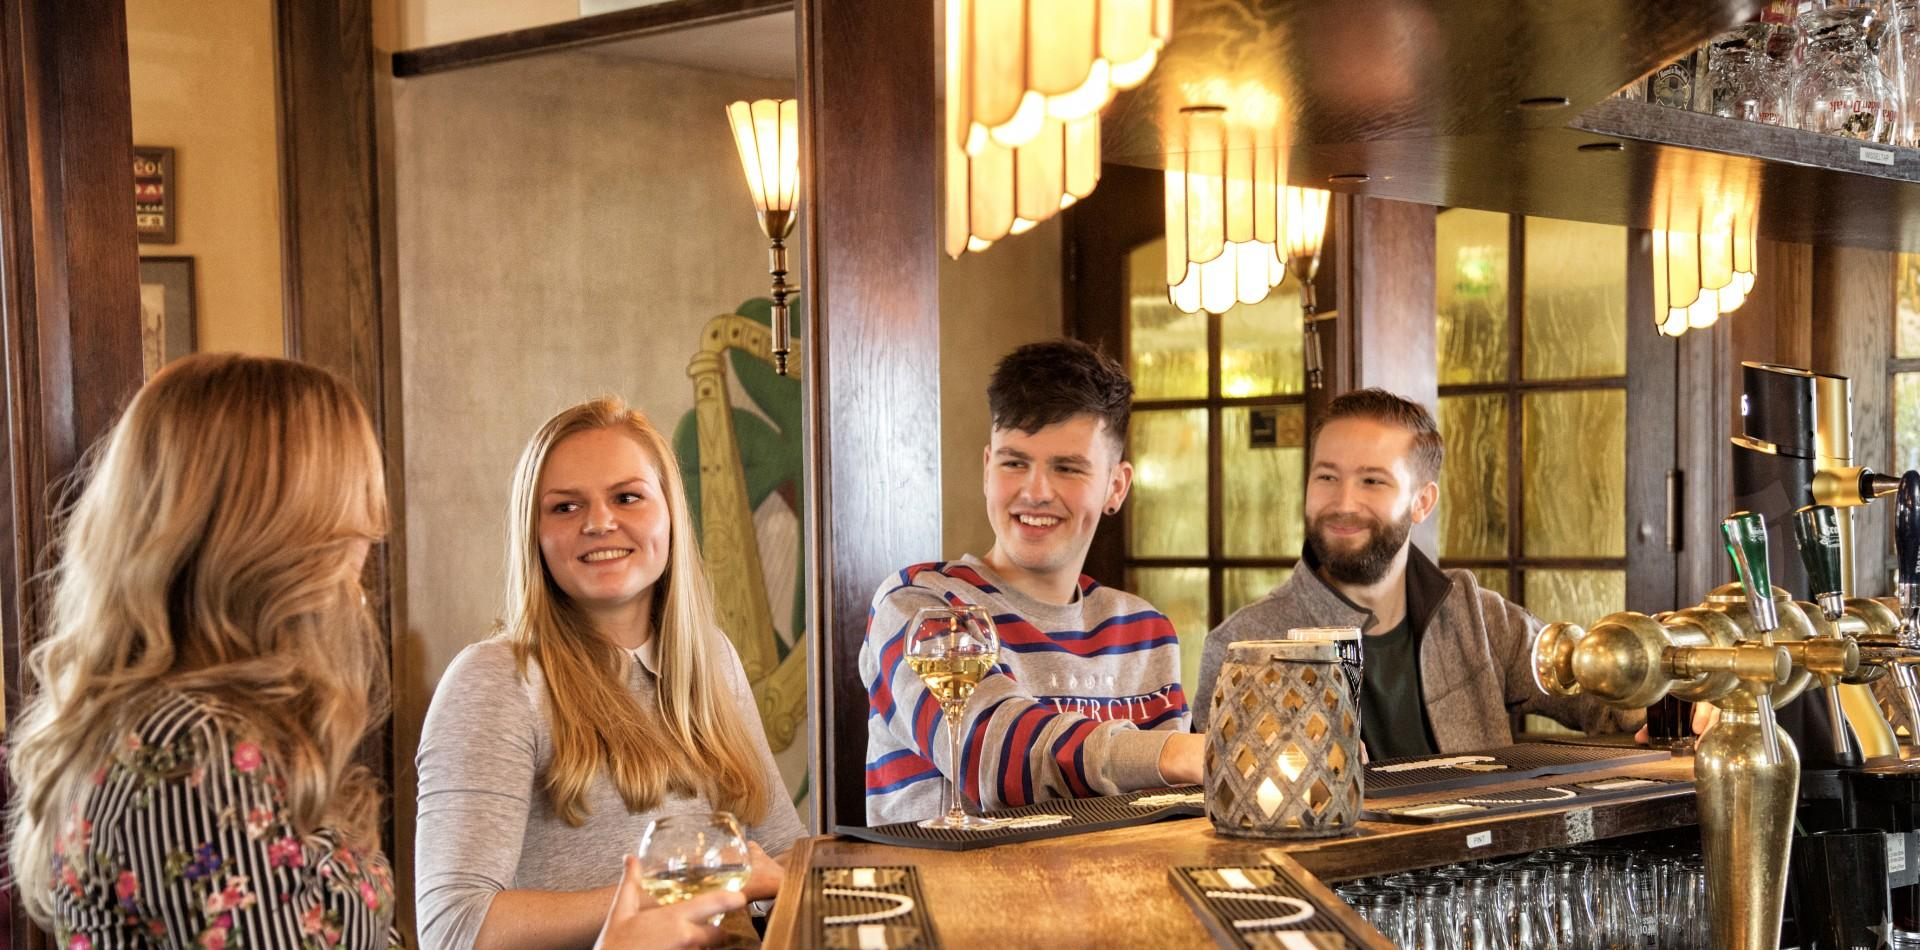 Iers restaurant en pub de Turfsteker in Westerbork